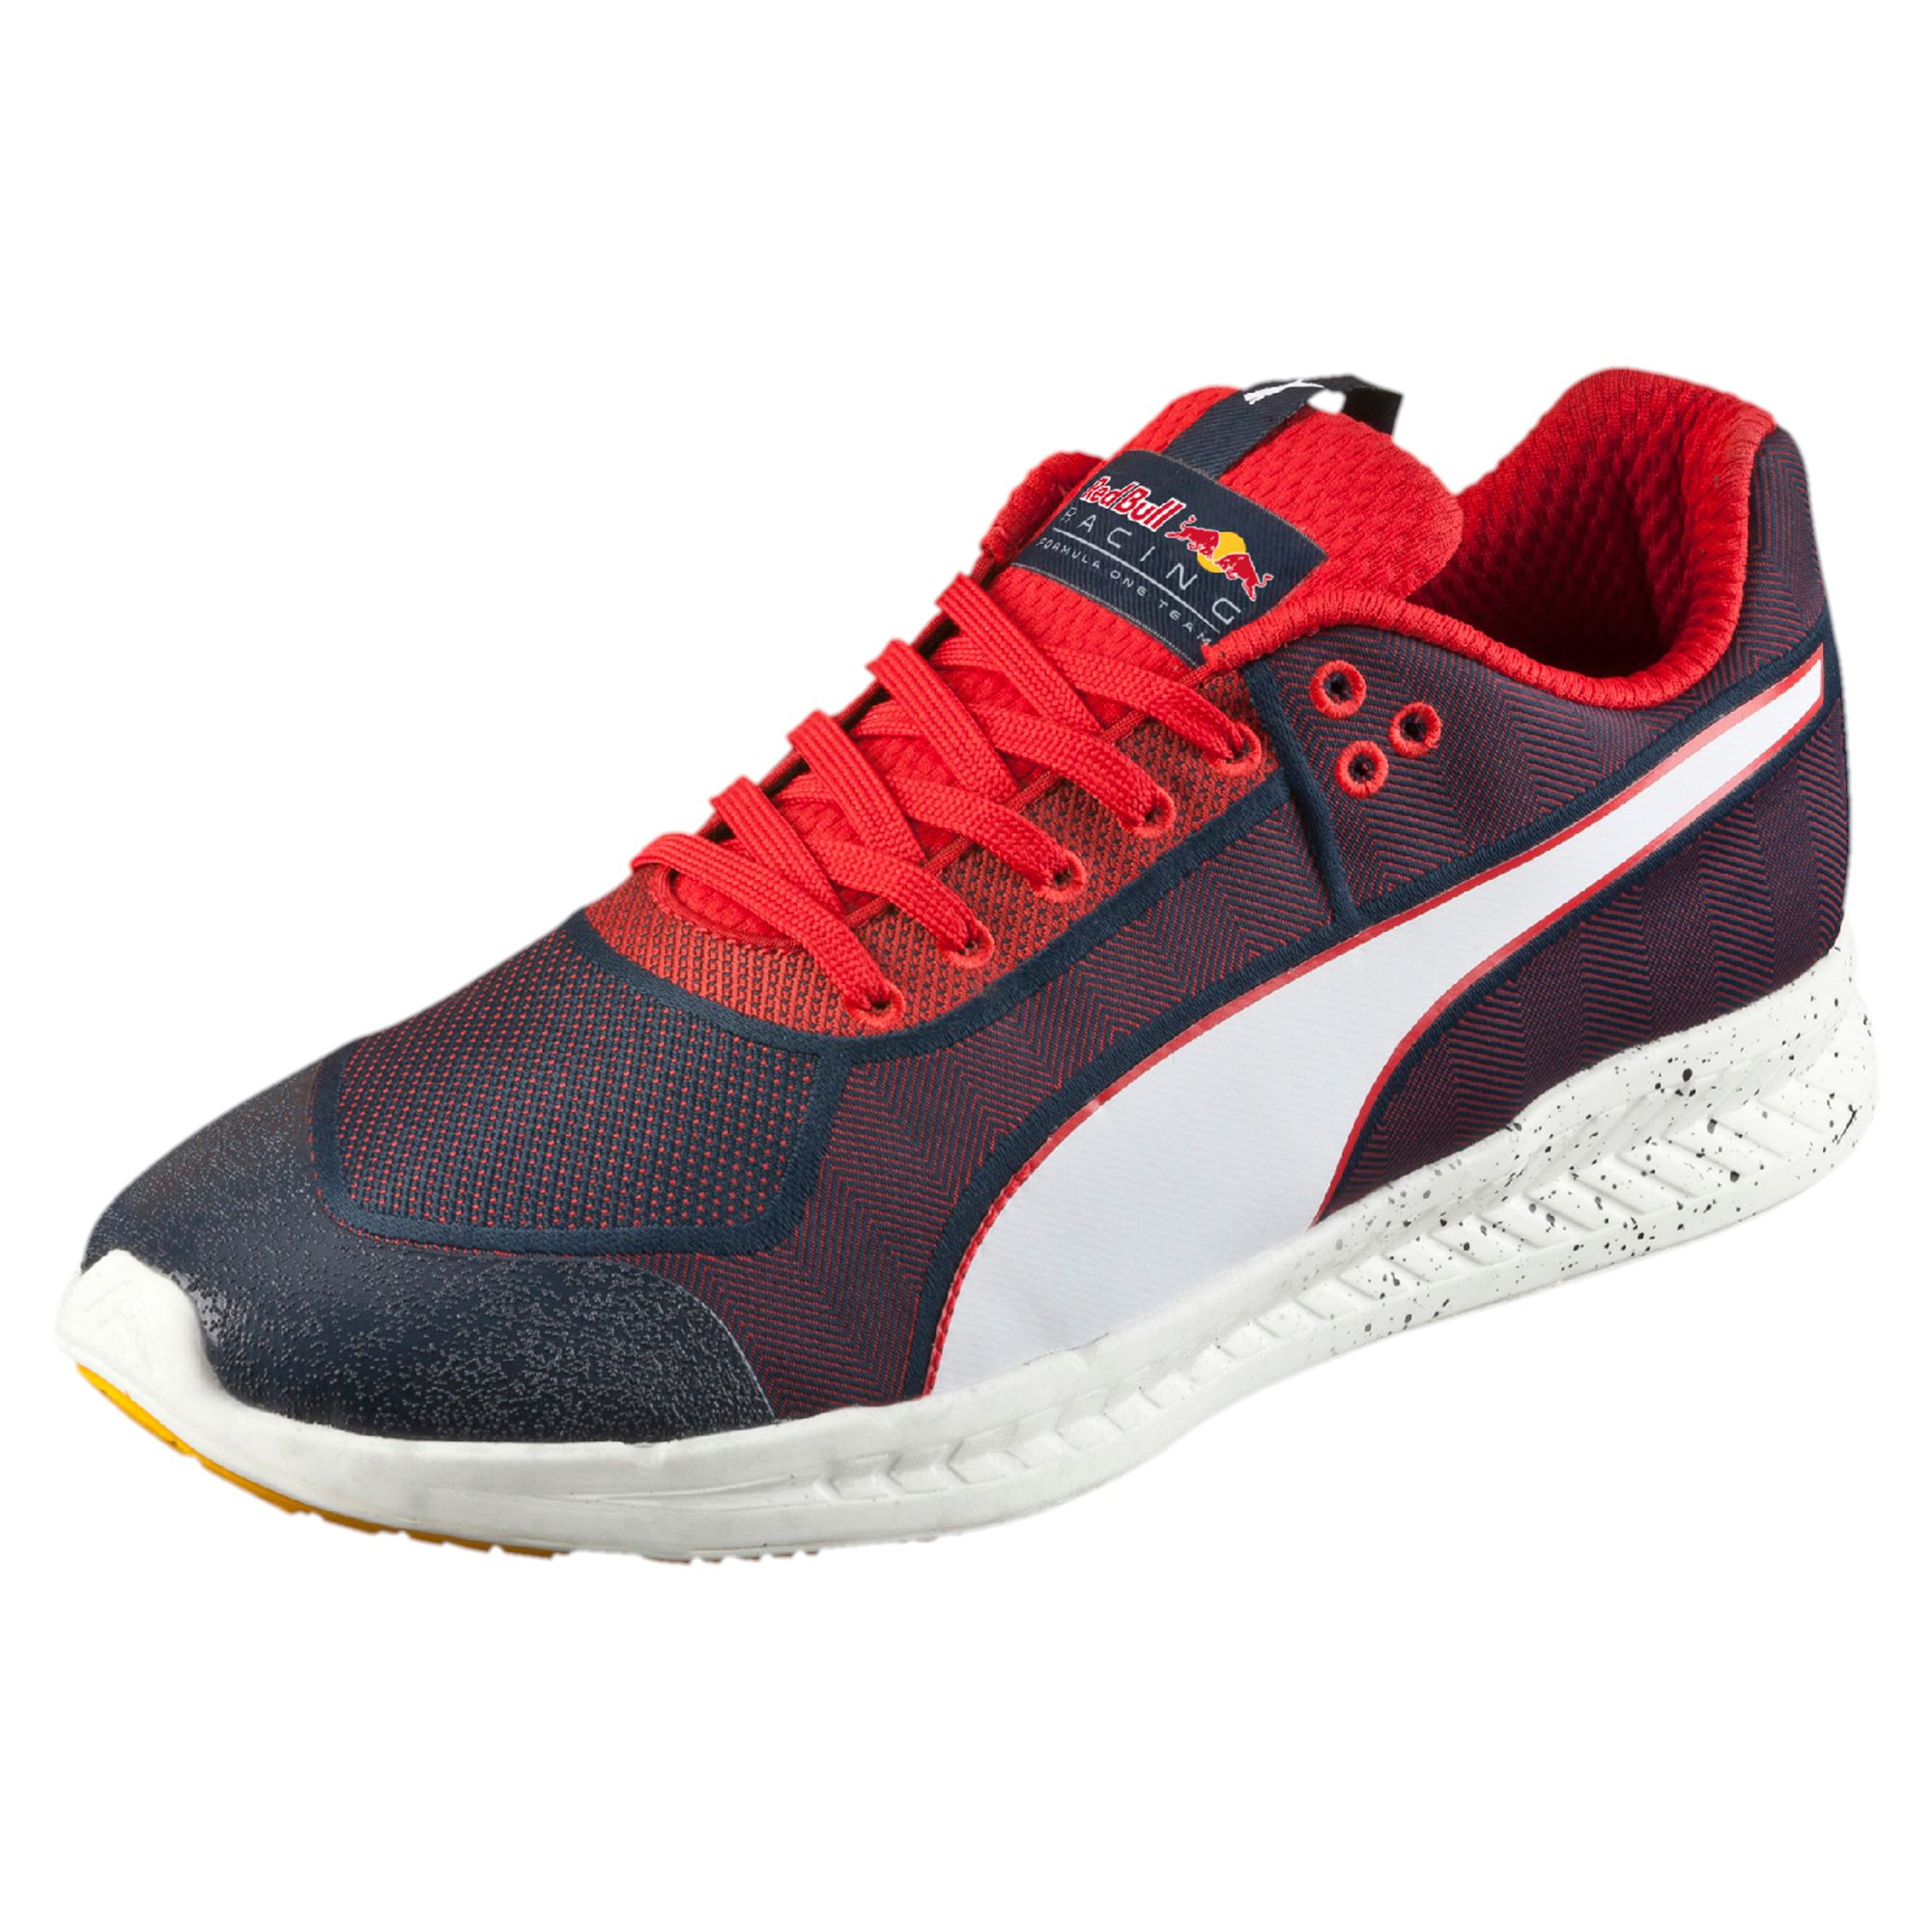 puma red bull racing mechs ignite men 39 s shoes in multicolor for men lyst. Black Bedroom Furniture Sets. Home Design Ideas